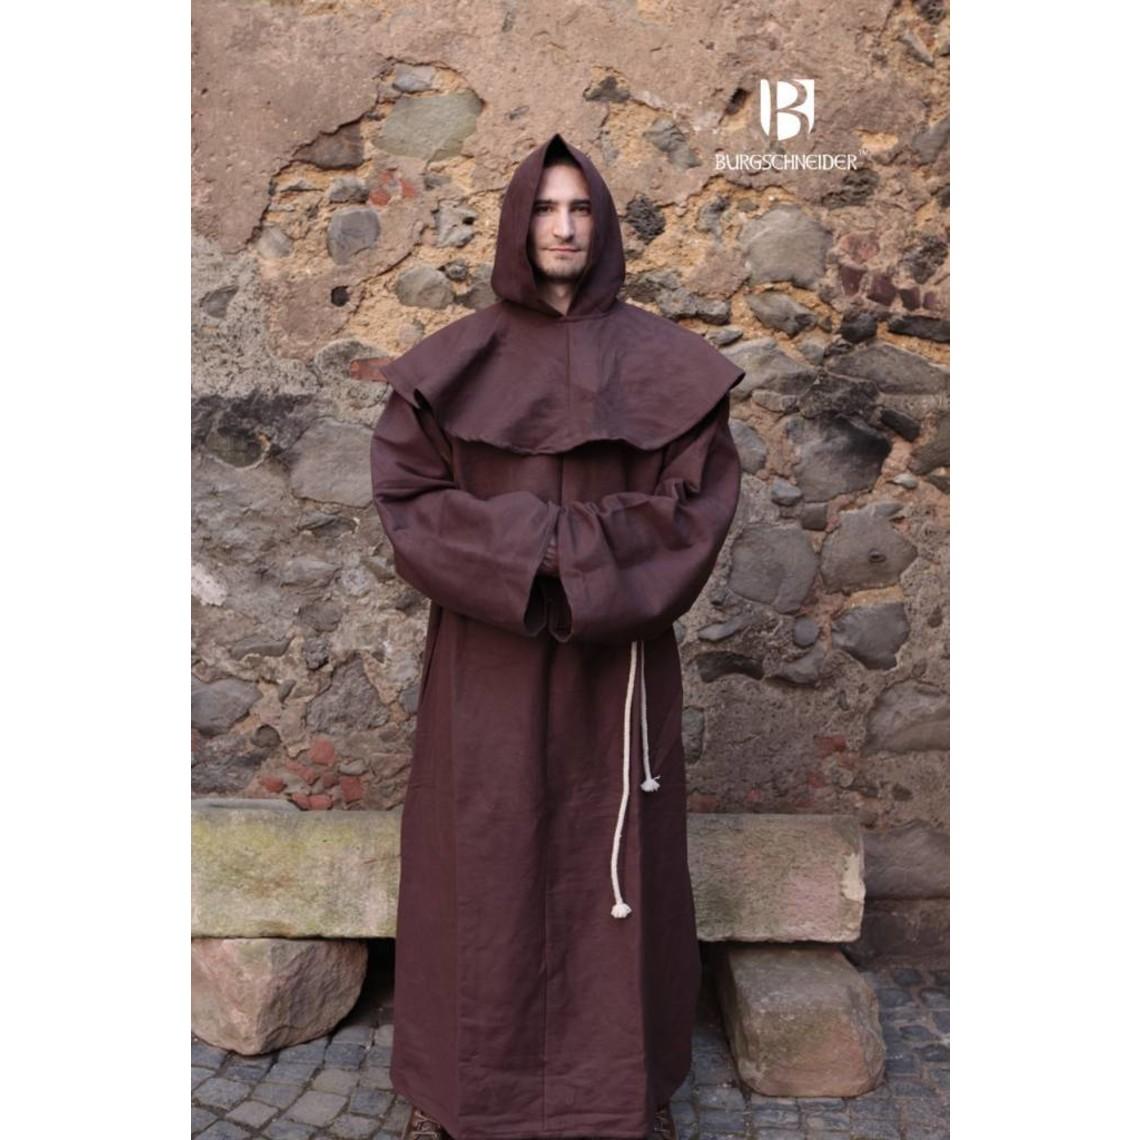 Burgschneider Abito francescano